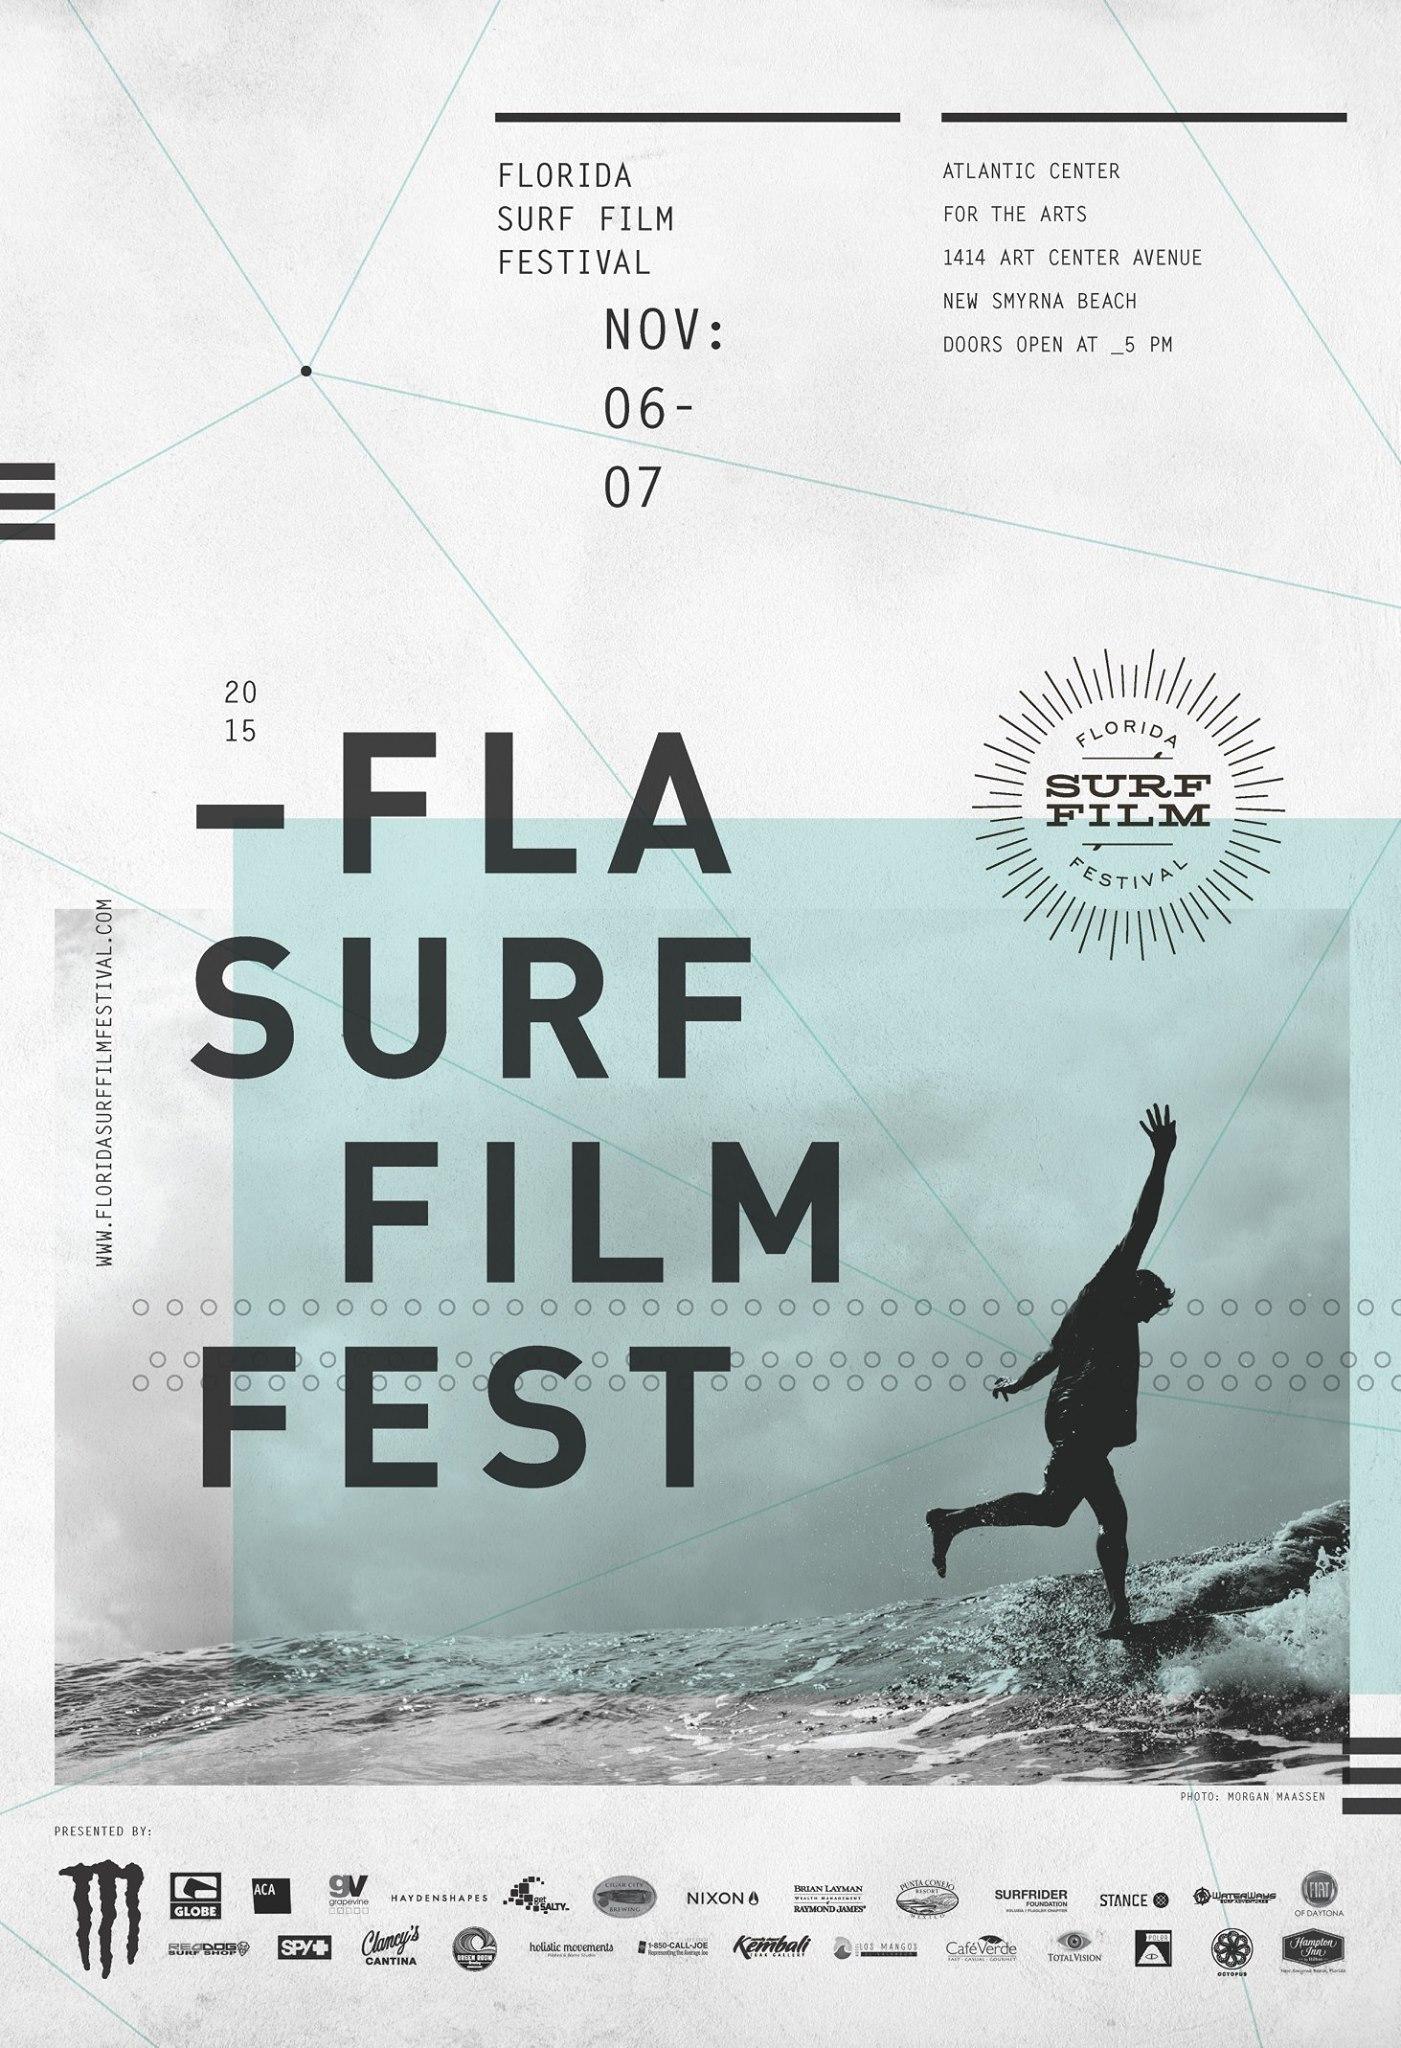 florida surf film festival 2015